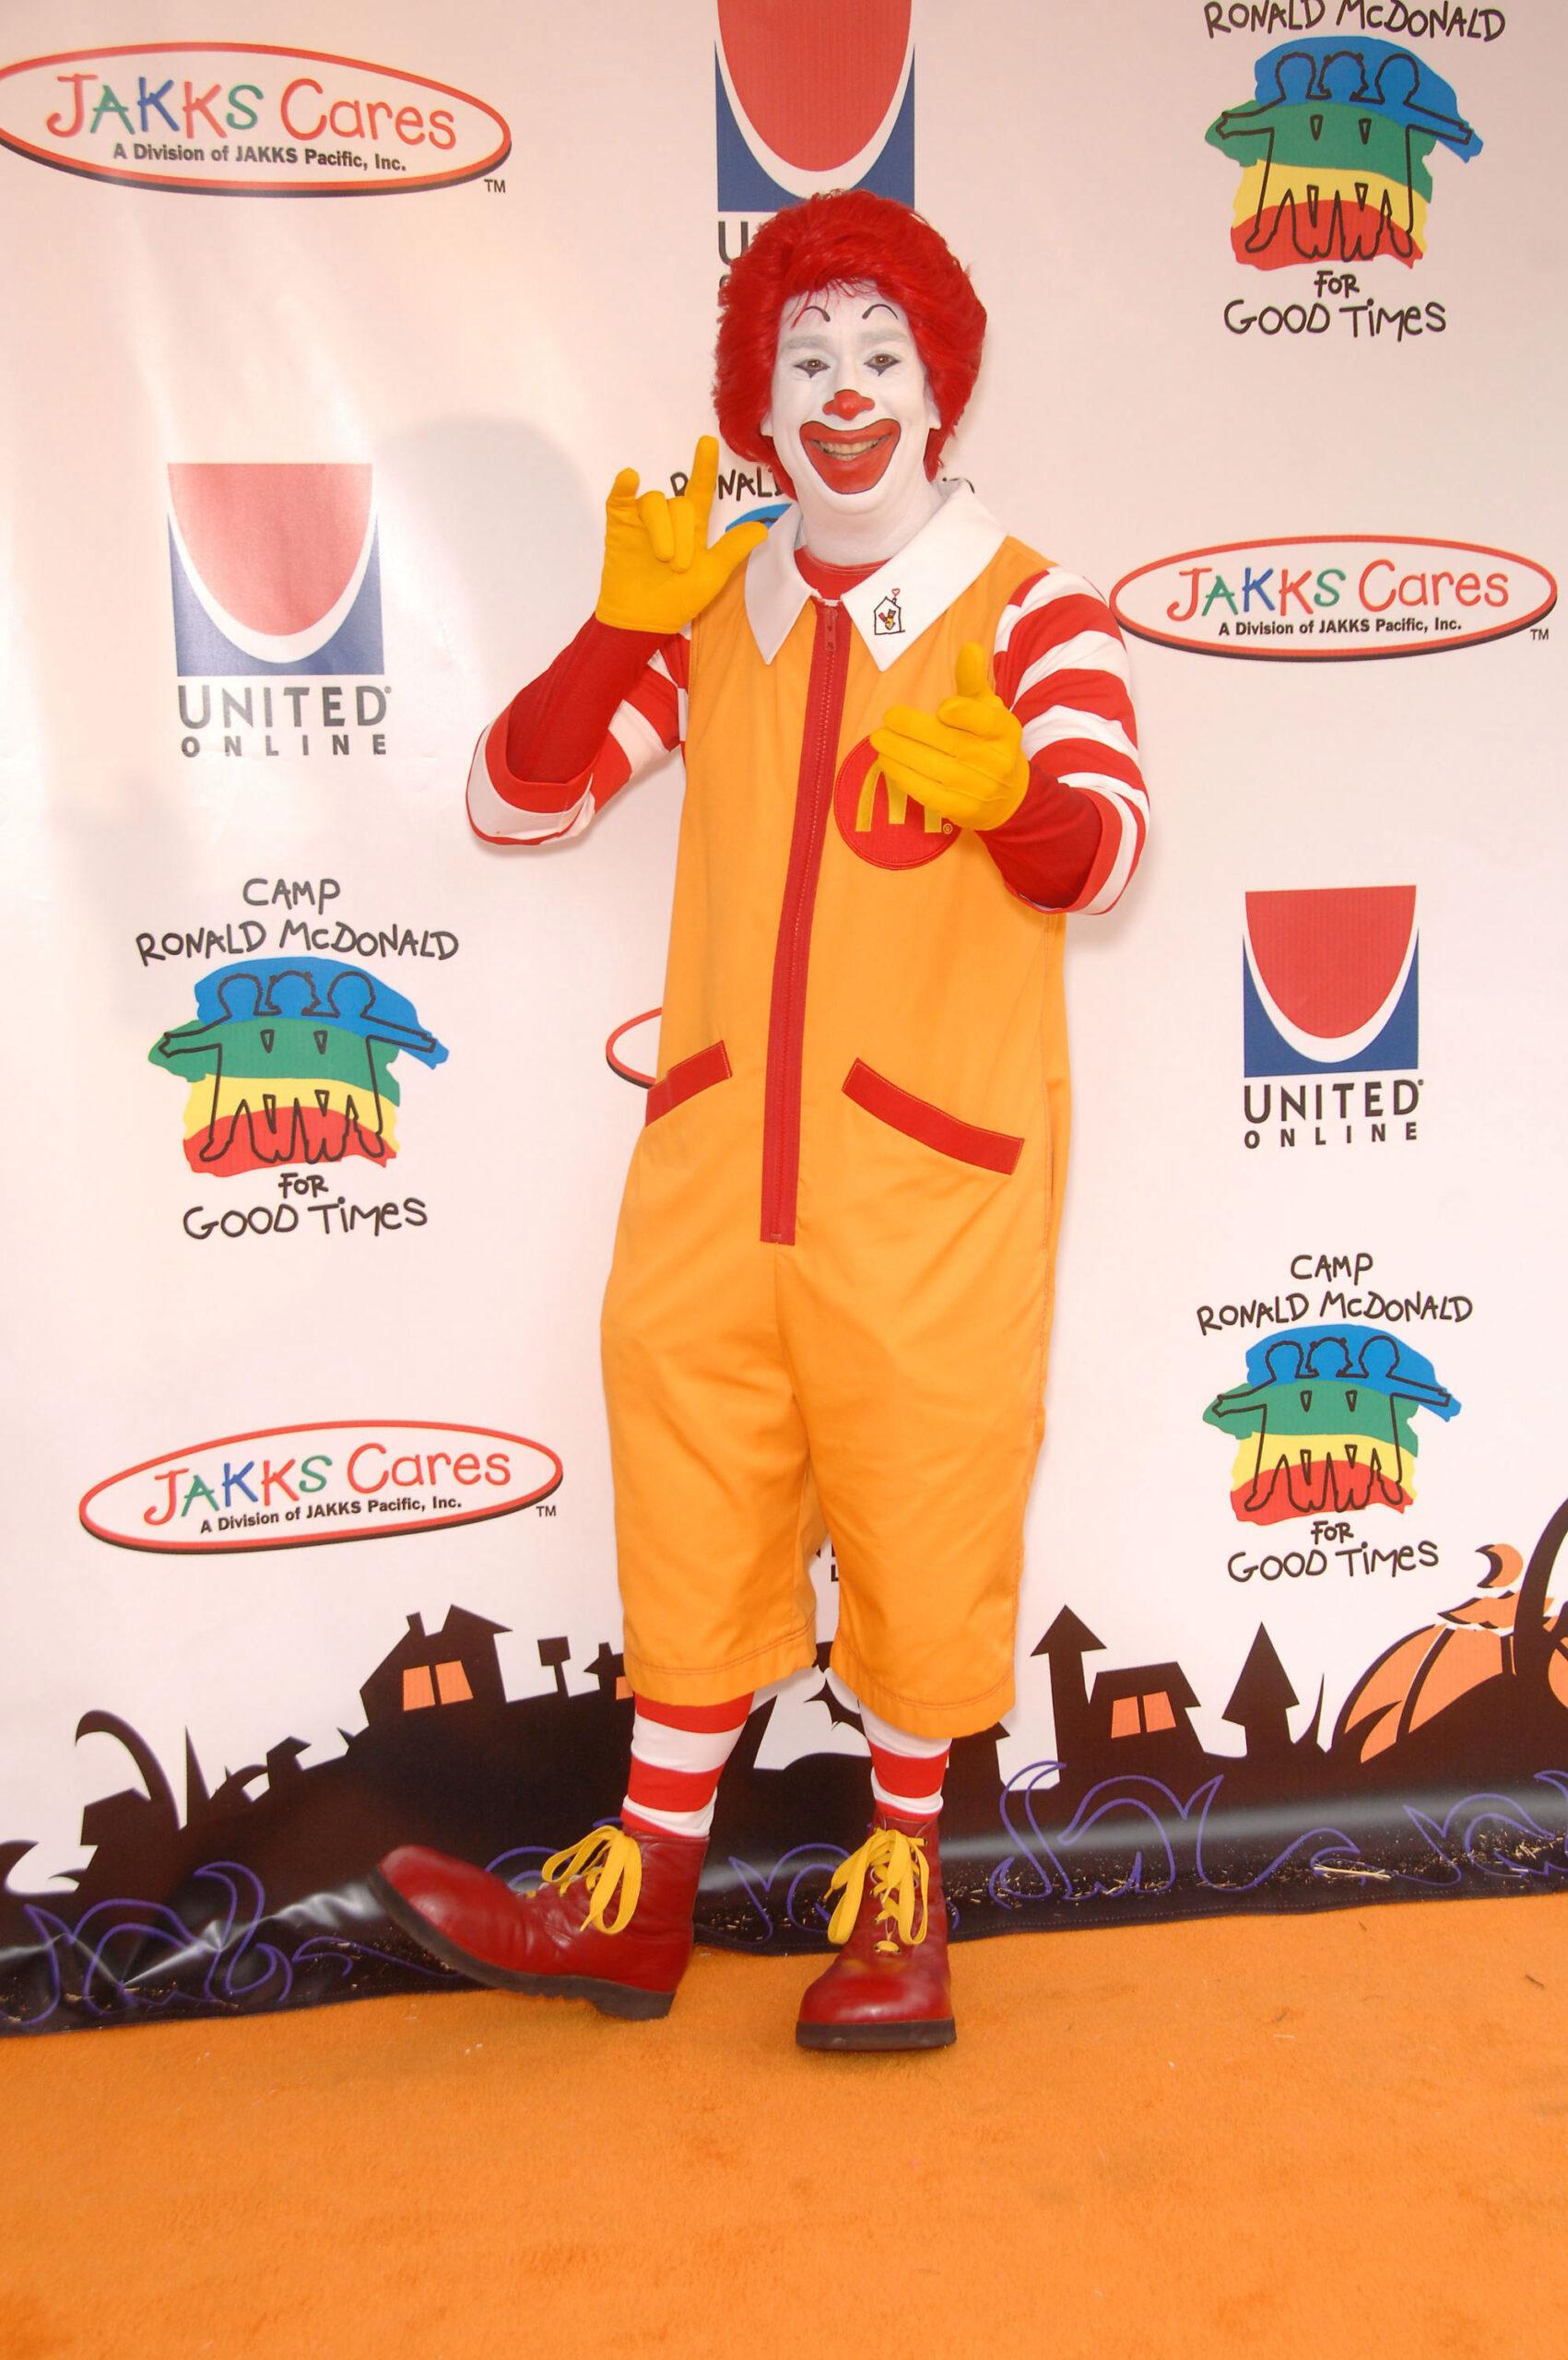 Ronald McDonald characters